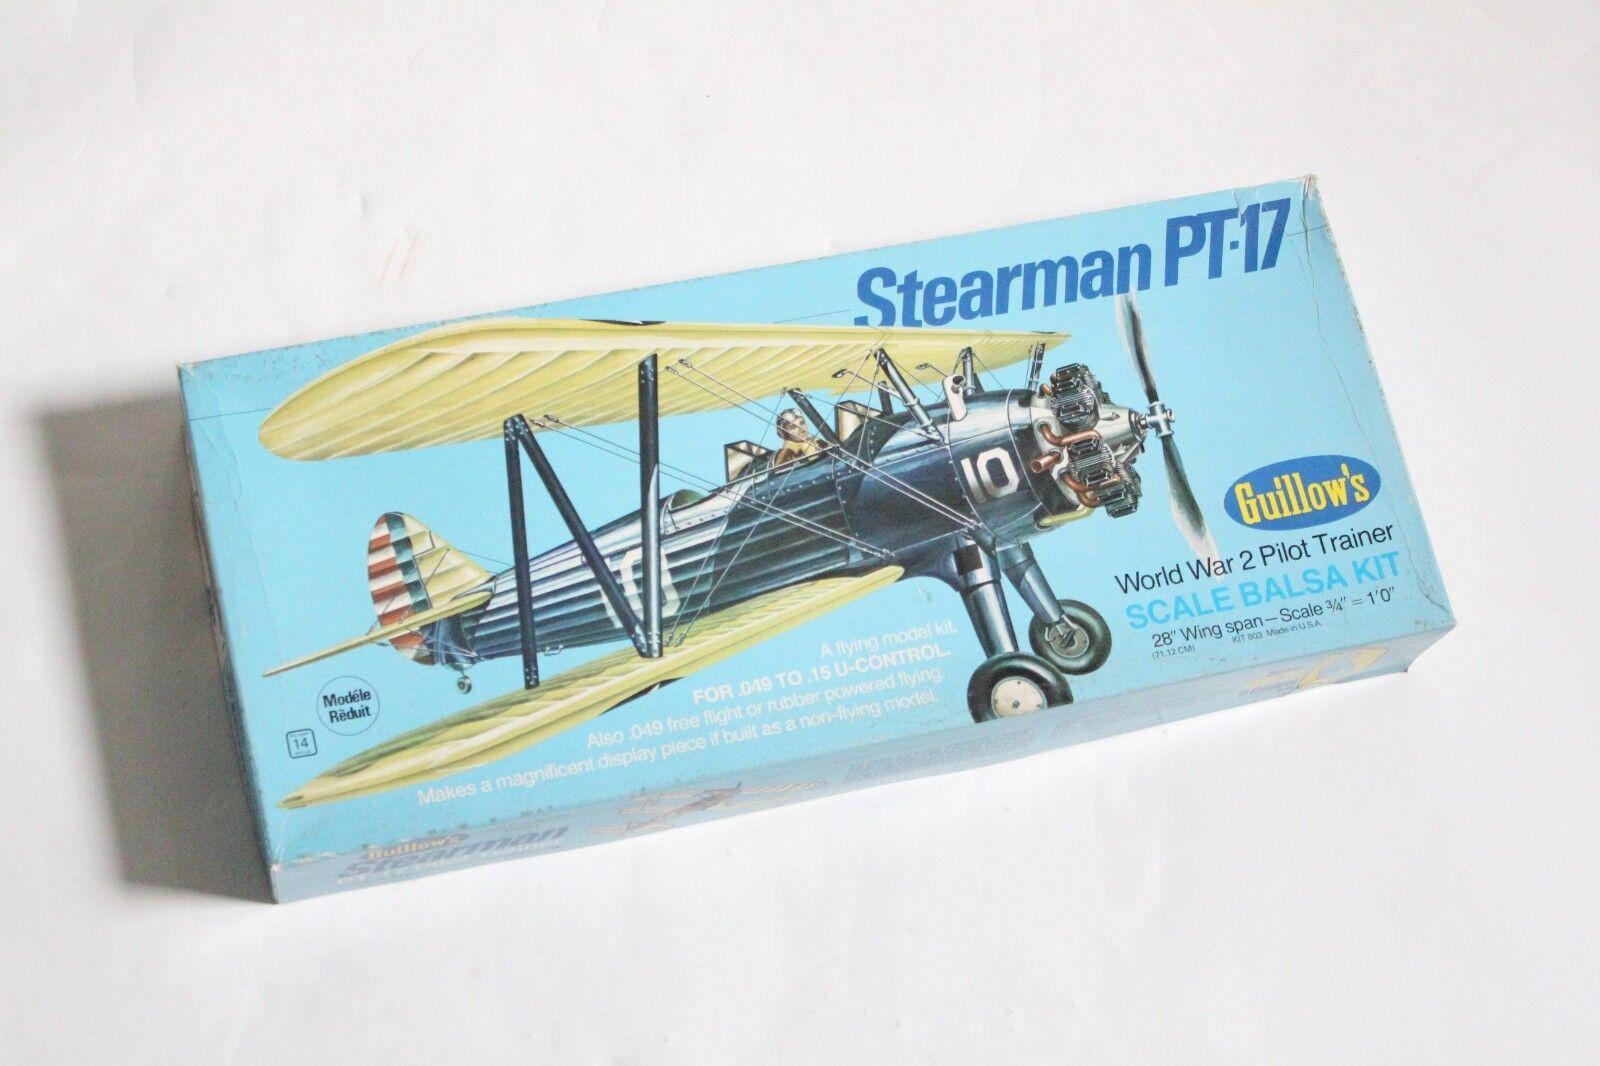 Guillows kit 803 stearman pt-17 ww2 pilot trainer   model airplane kit